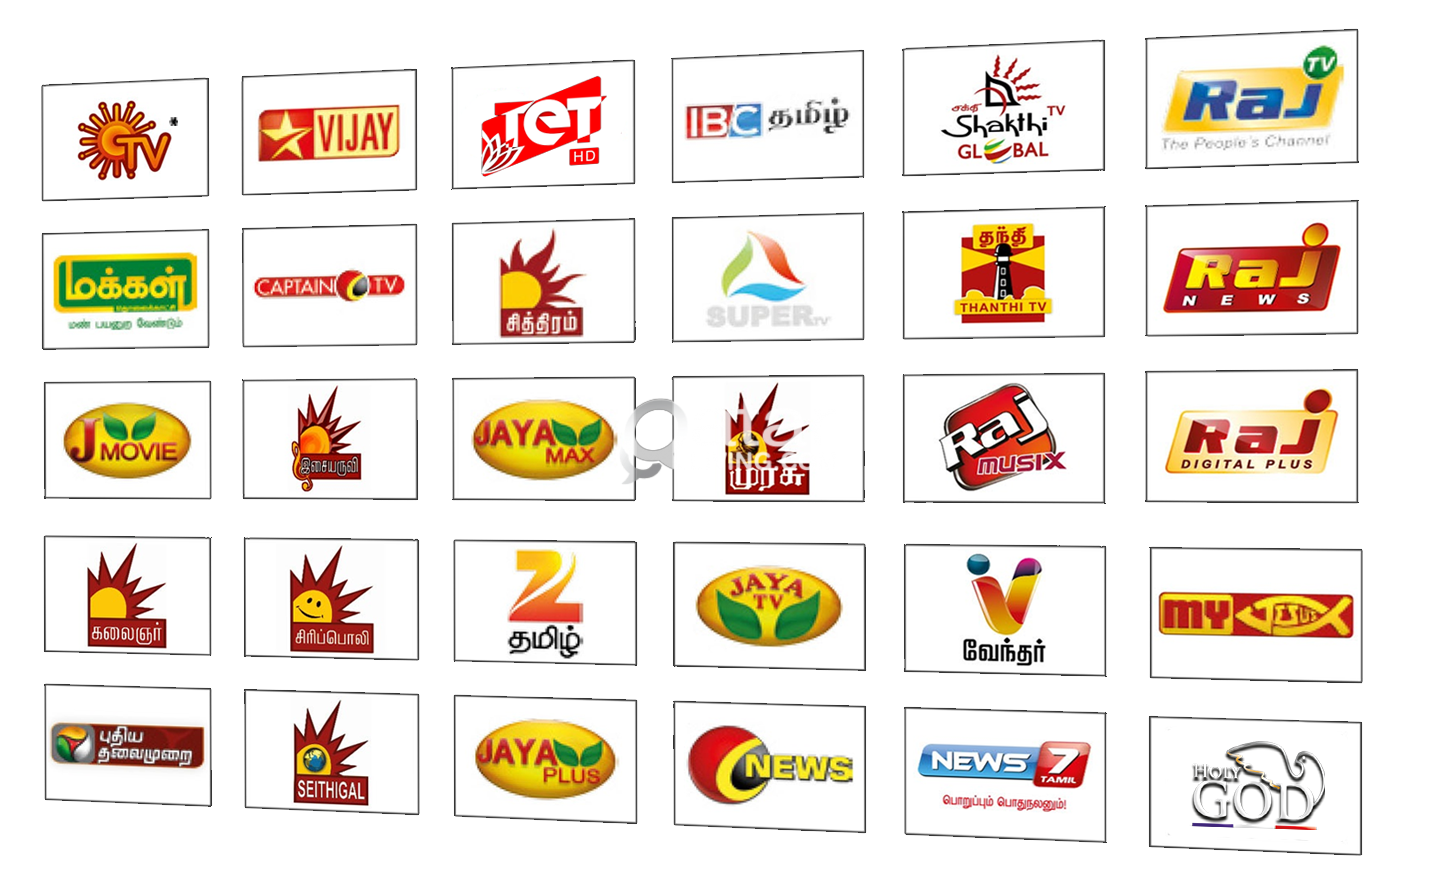 JADOO 3 TV , IPTV DESI TV channels | Qatar Living